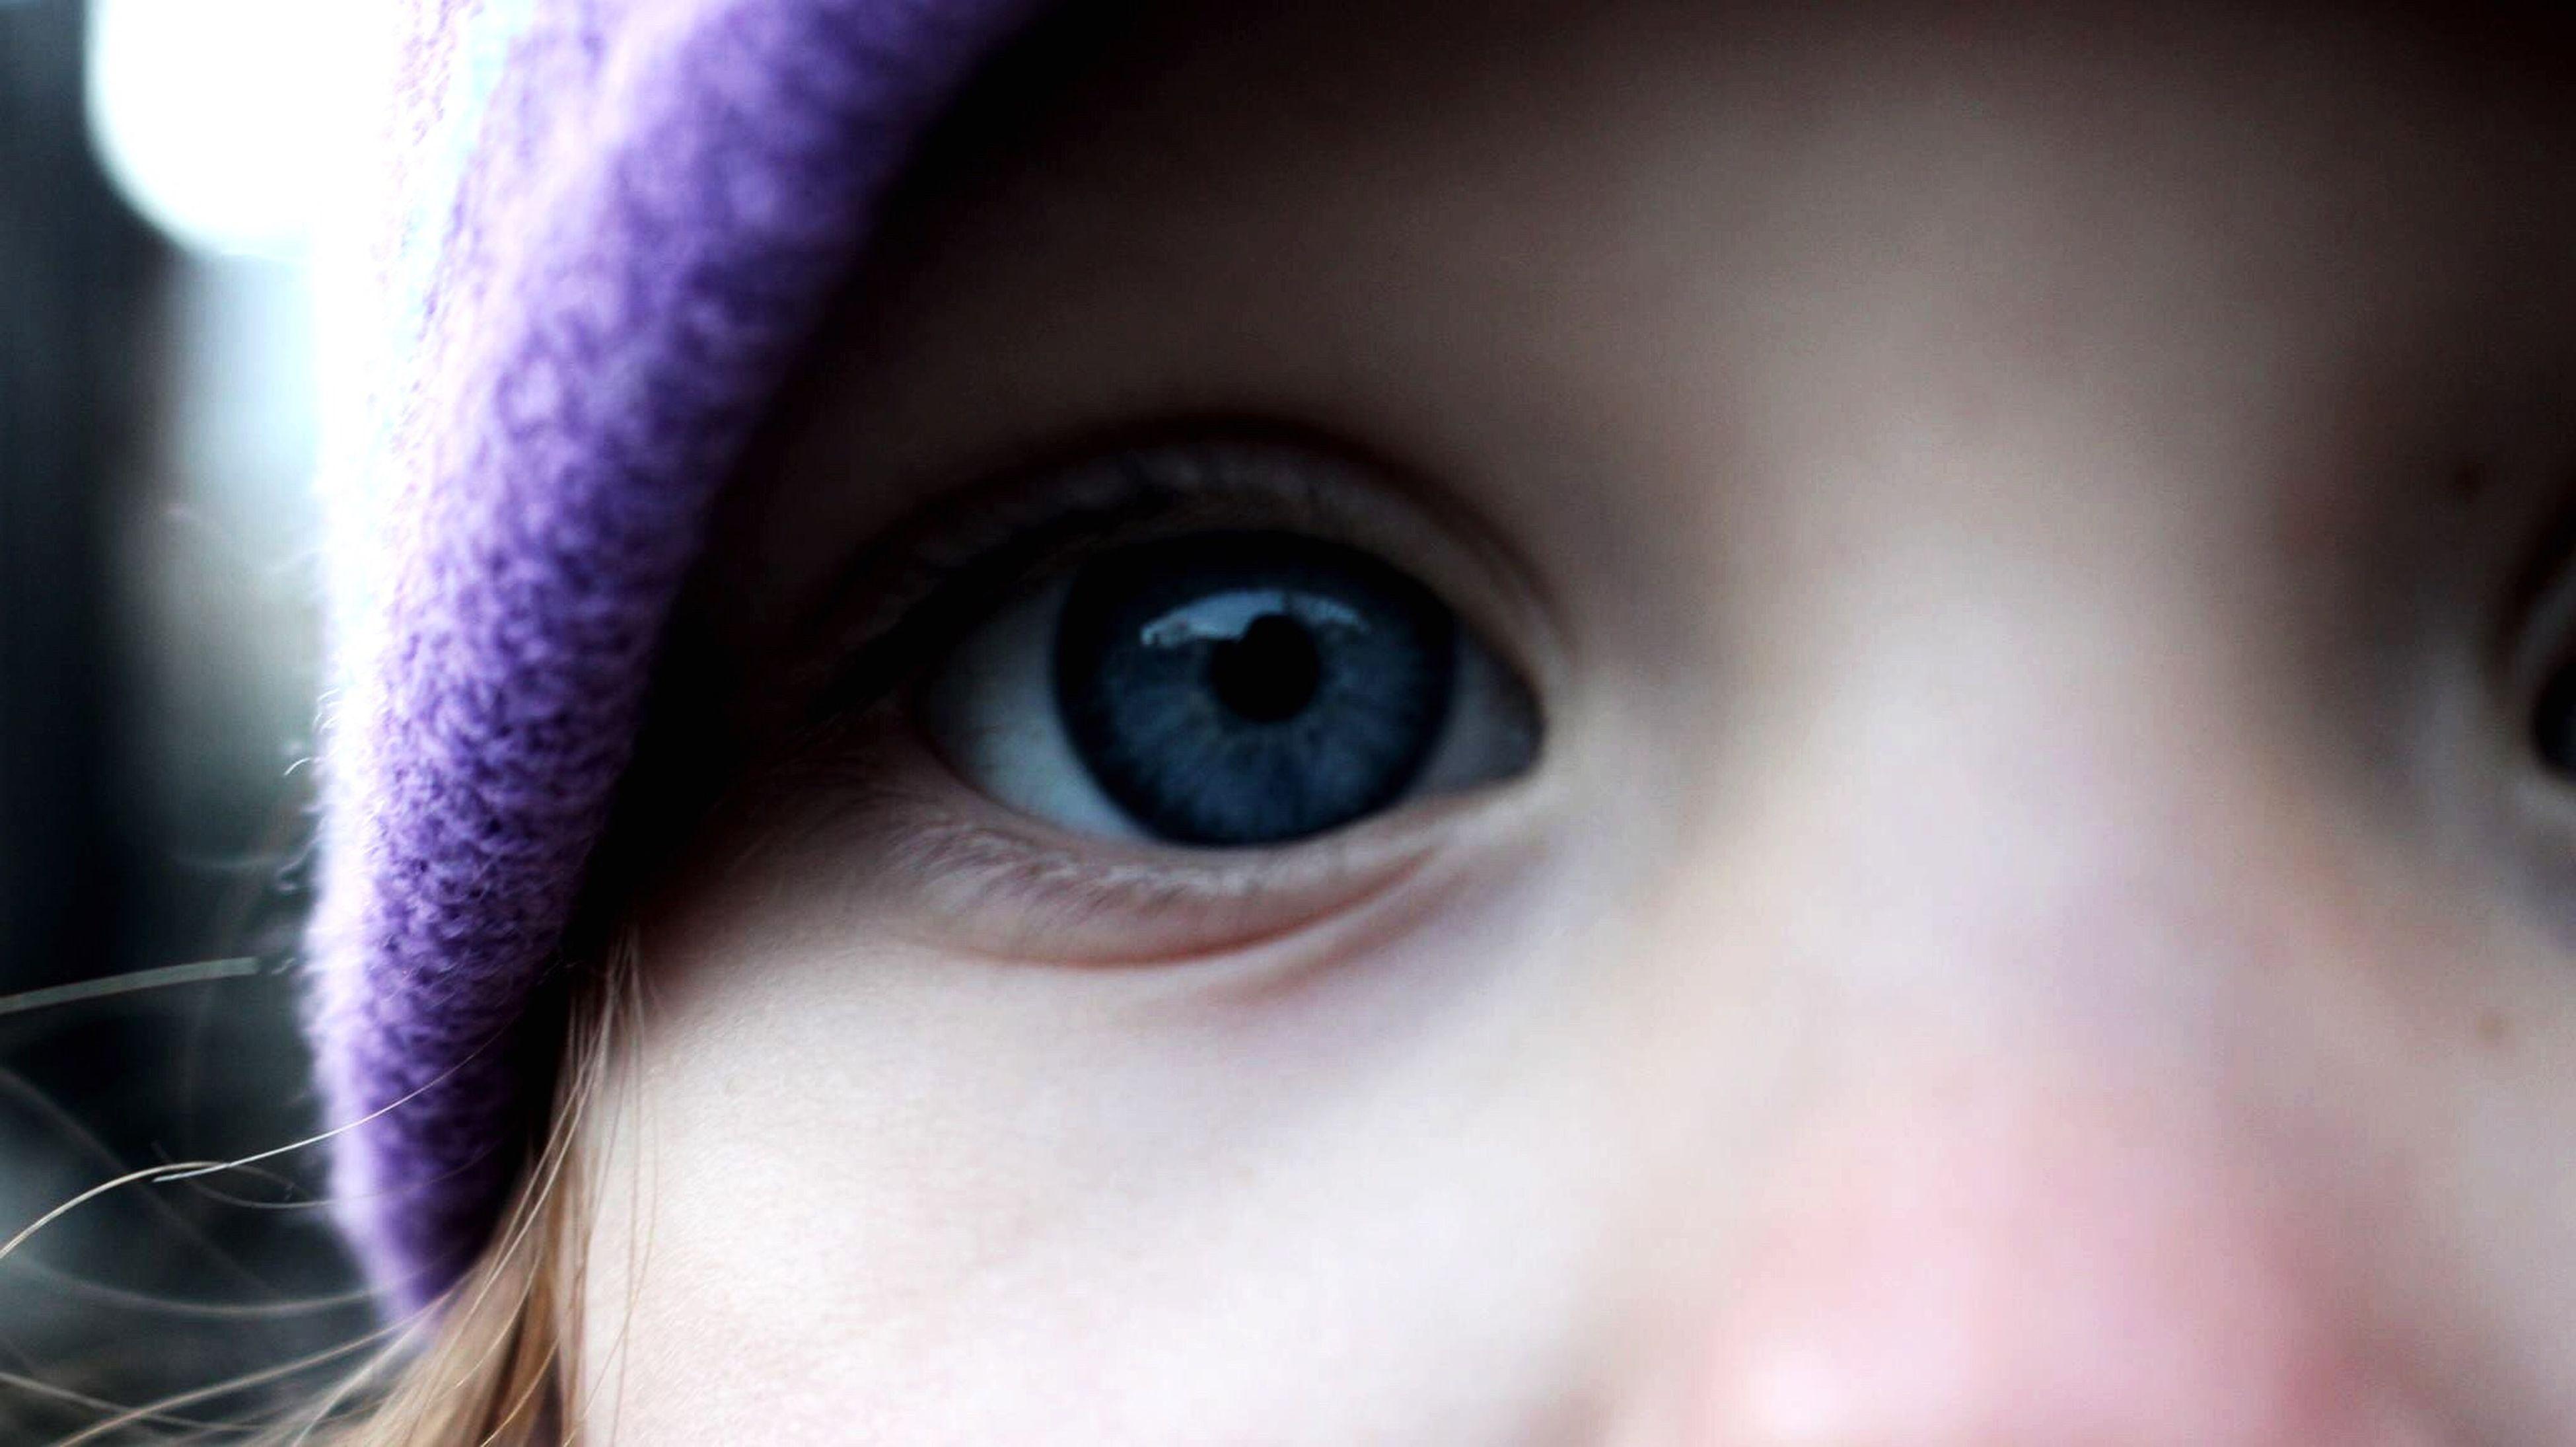 close-up, human eye, looking at camera, portrait, part of, human face, eyelash, headshot, eyesight, lifestyles, indoors, sensory perception, front view, selective focus, extreme close-up, full frame, focus on foreground